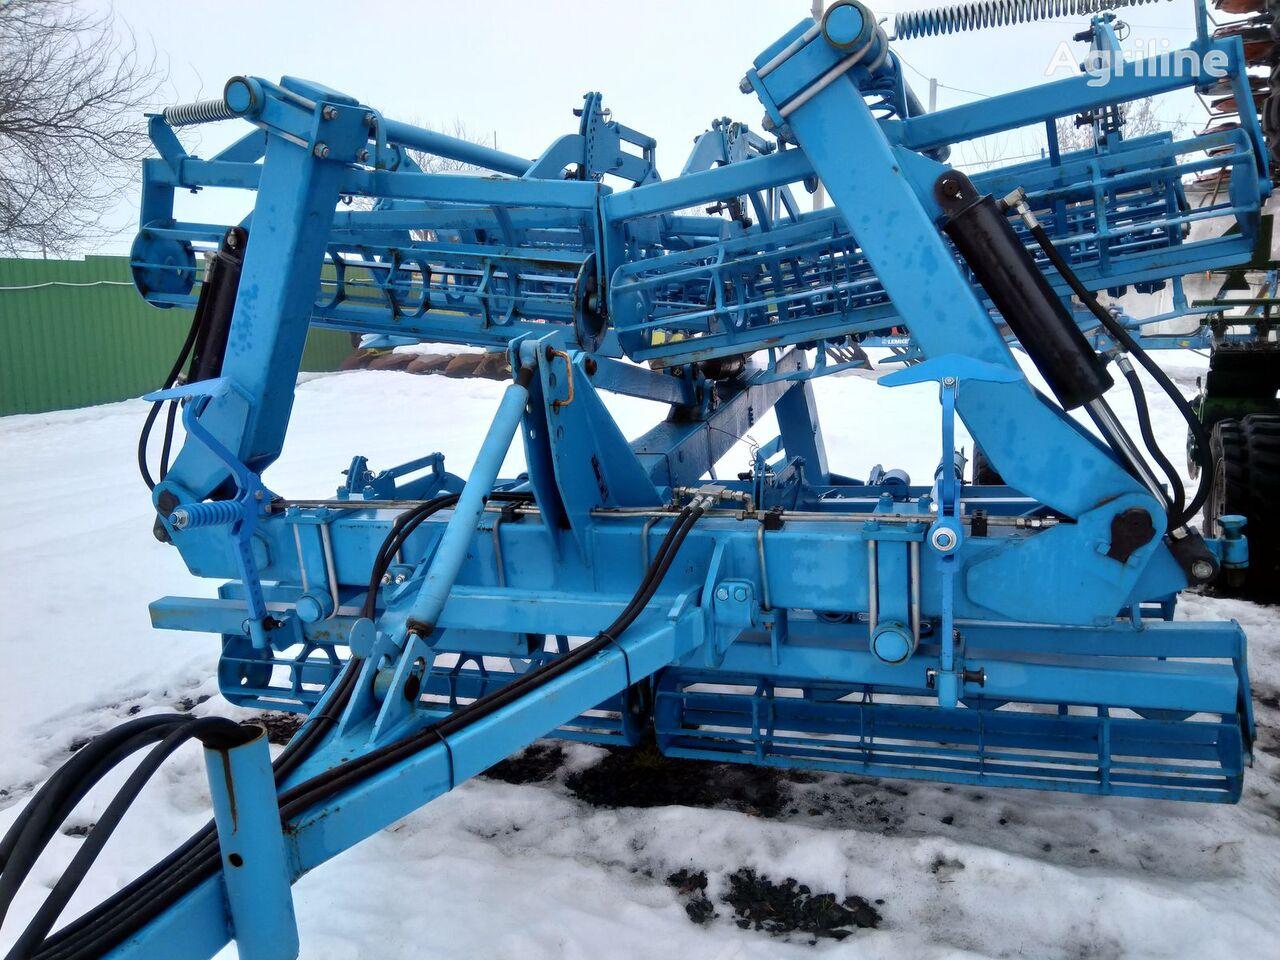 LEMKEN Kompaktor 600 seedbed cultivator